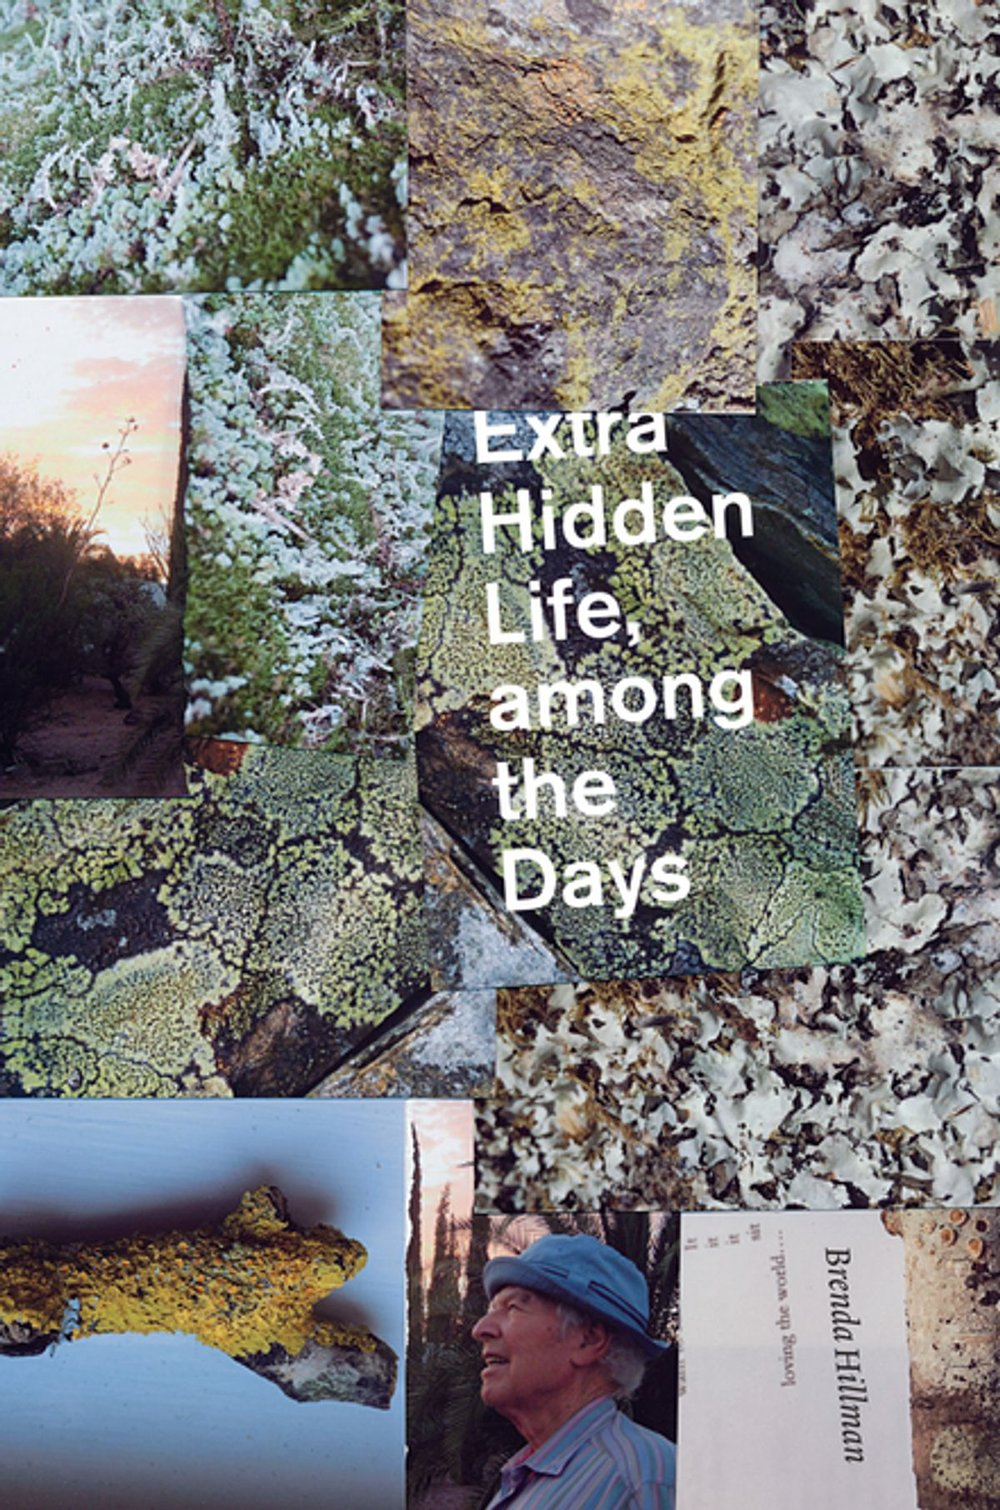 extra-hidden-life-among-the-days.jpg